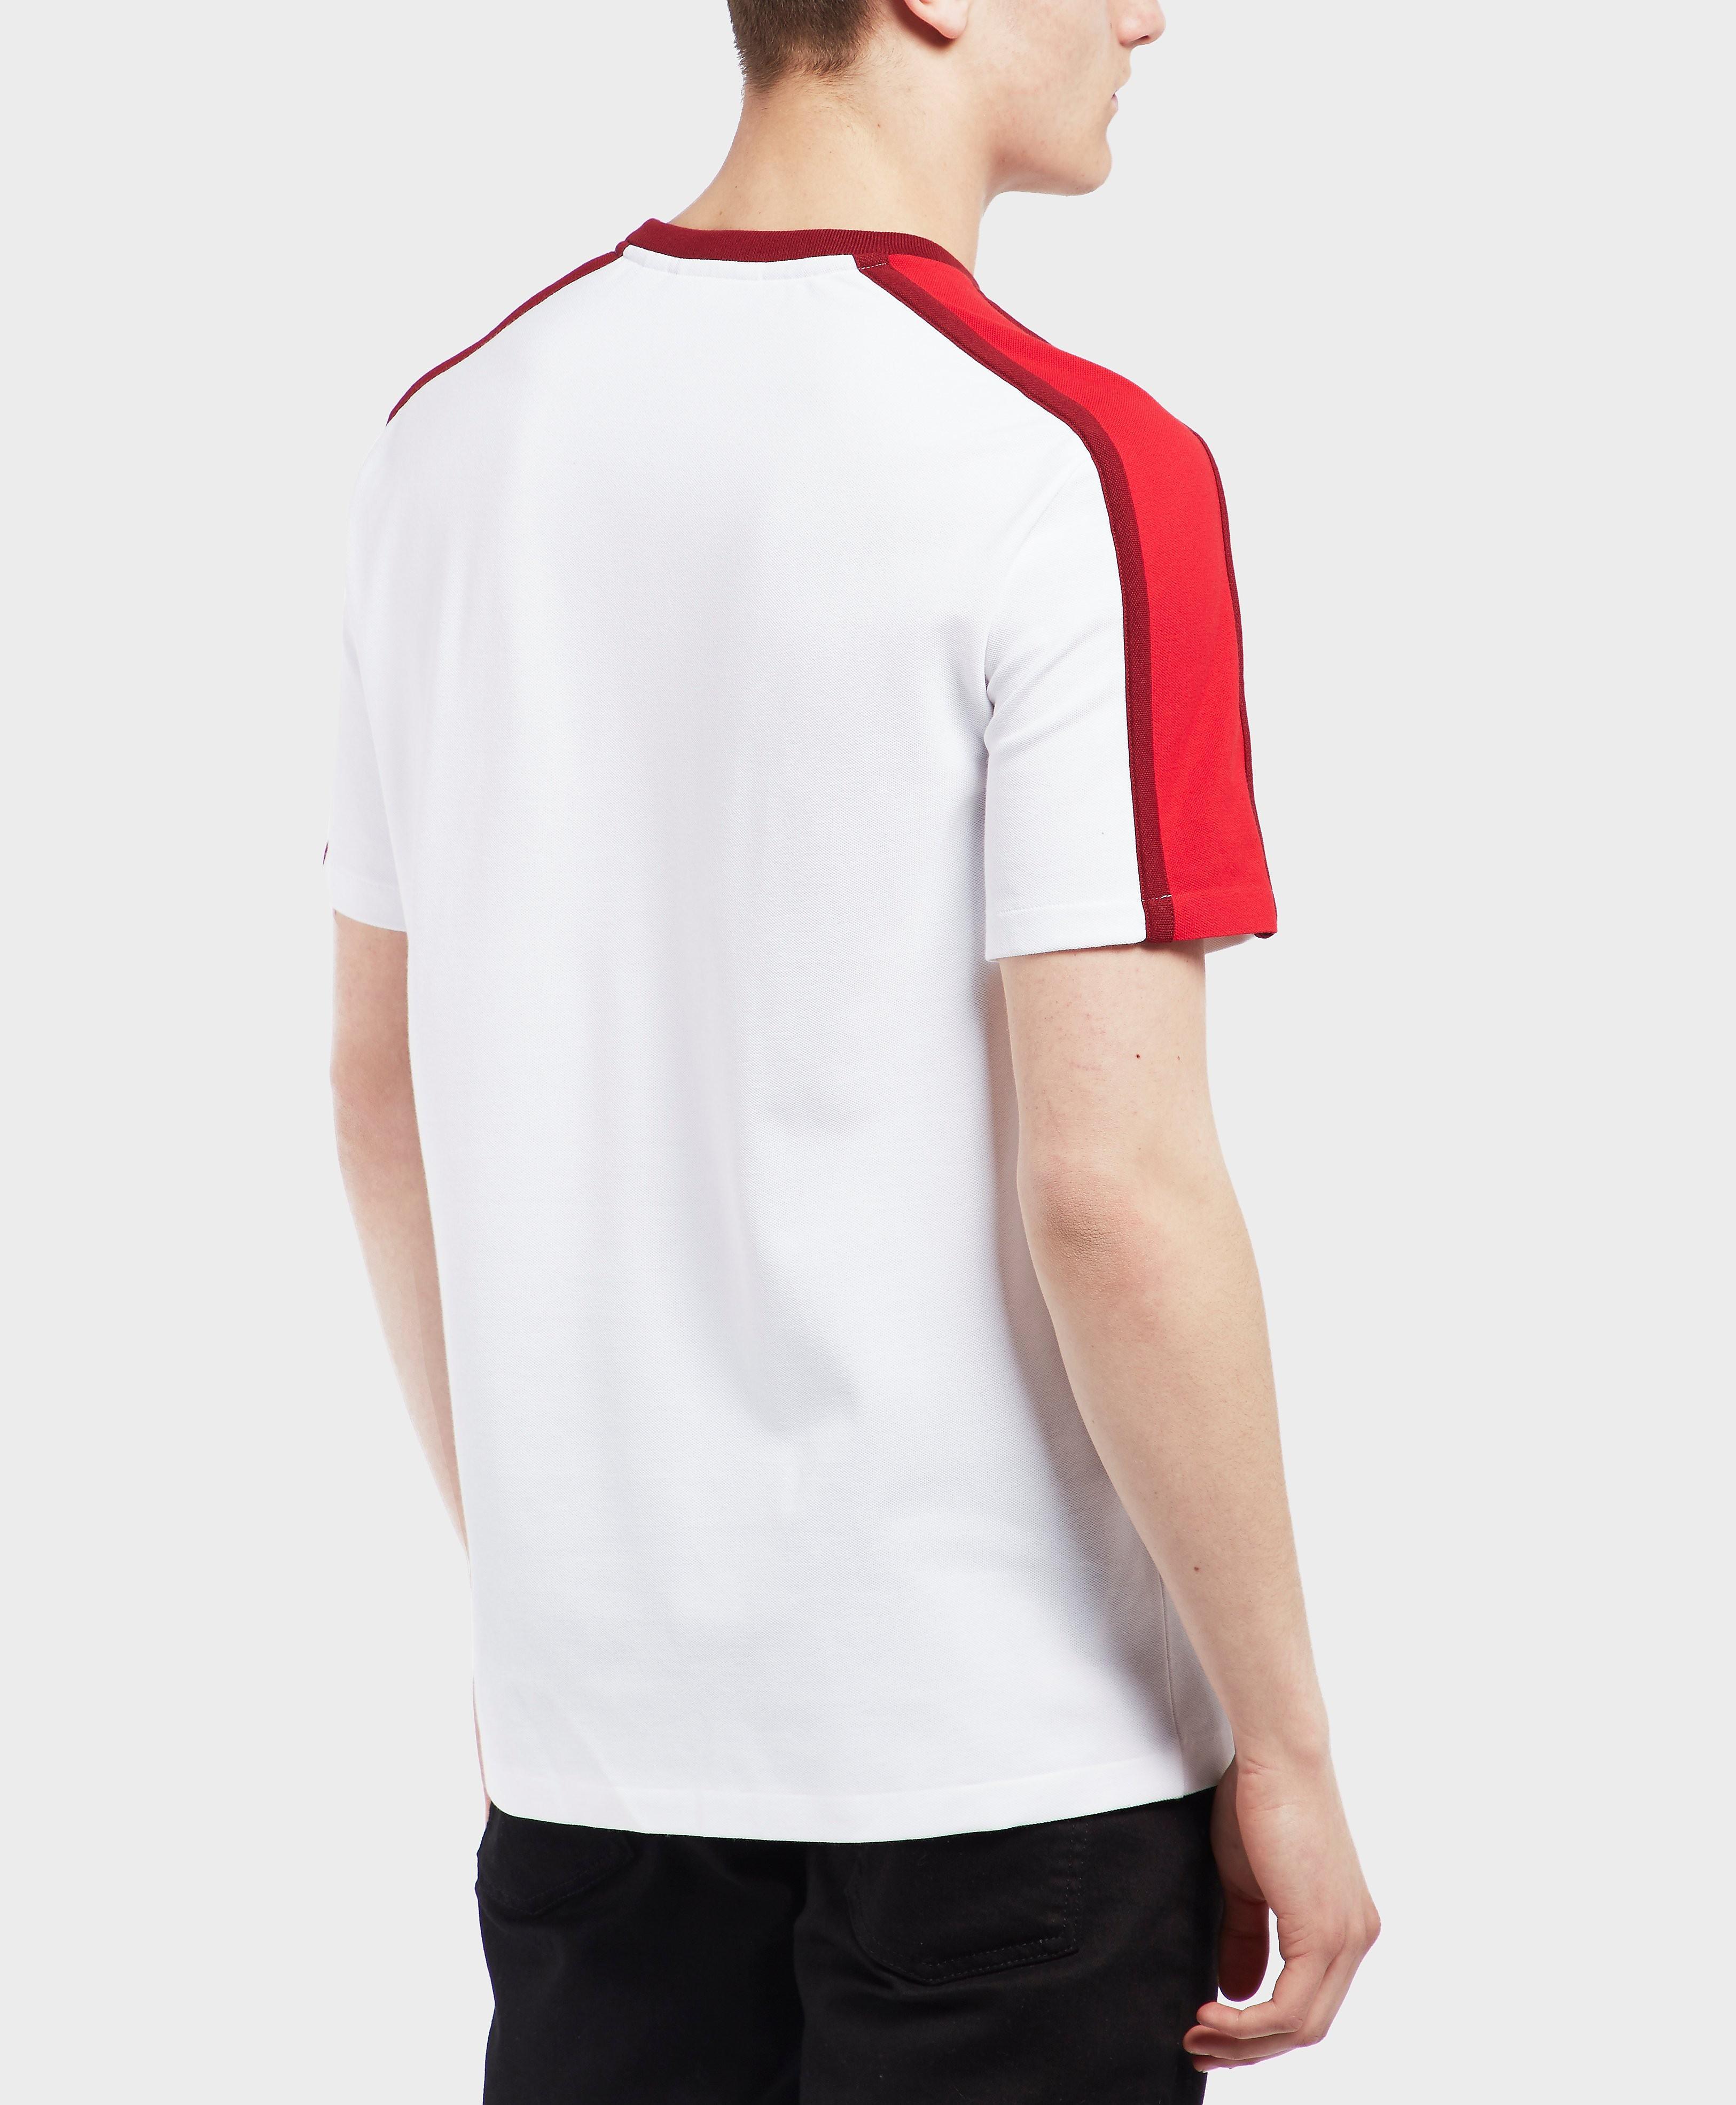 Lacoste Shoulder Block Short Sleeve T-Shirt